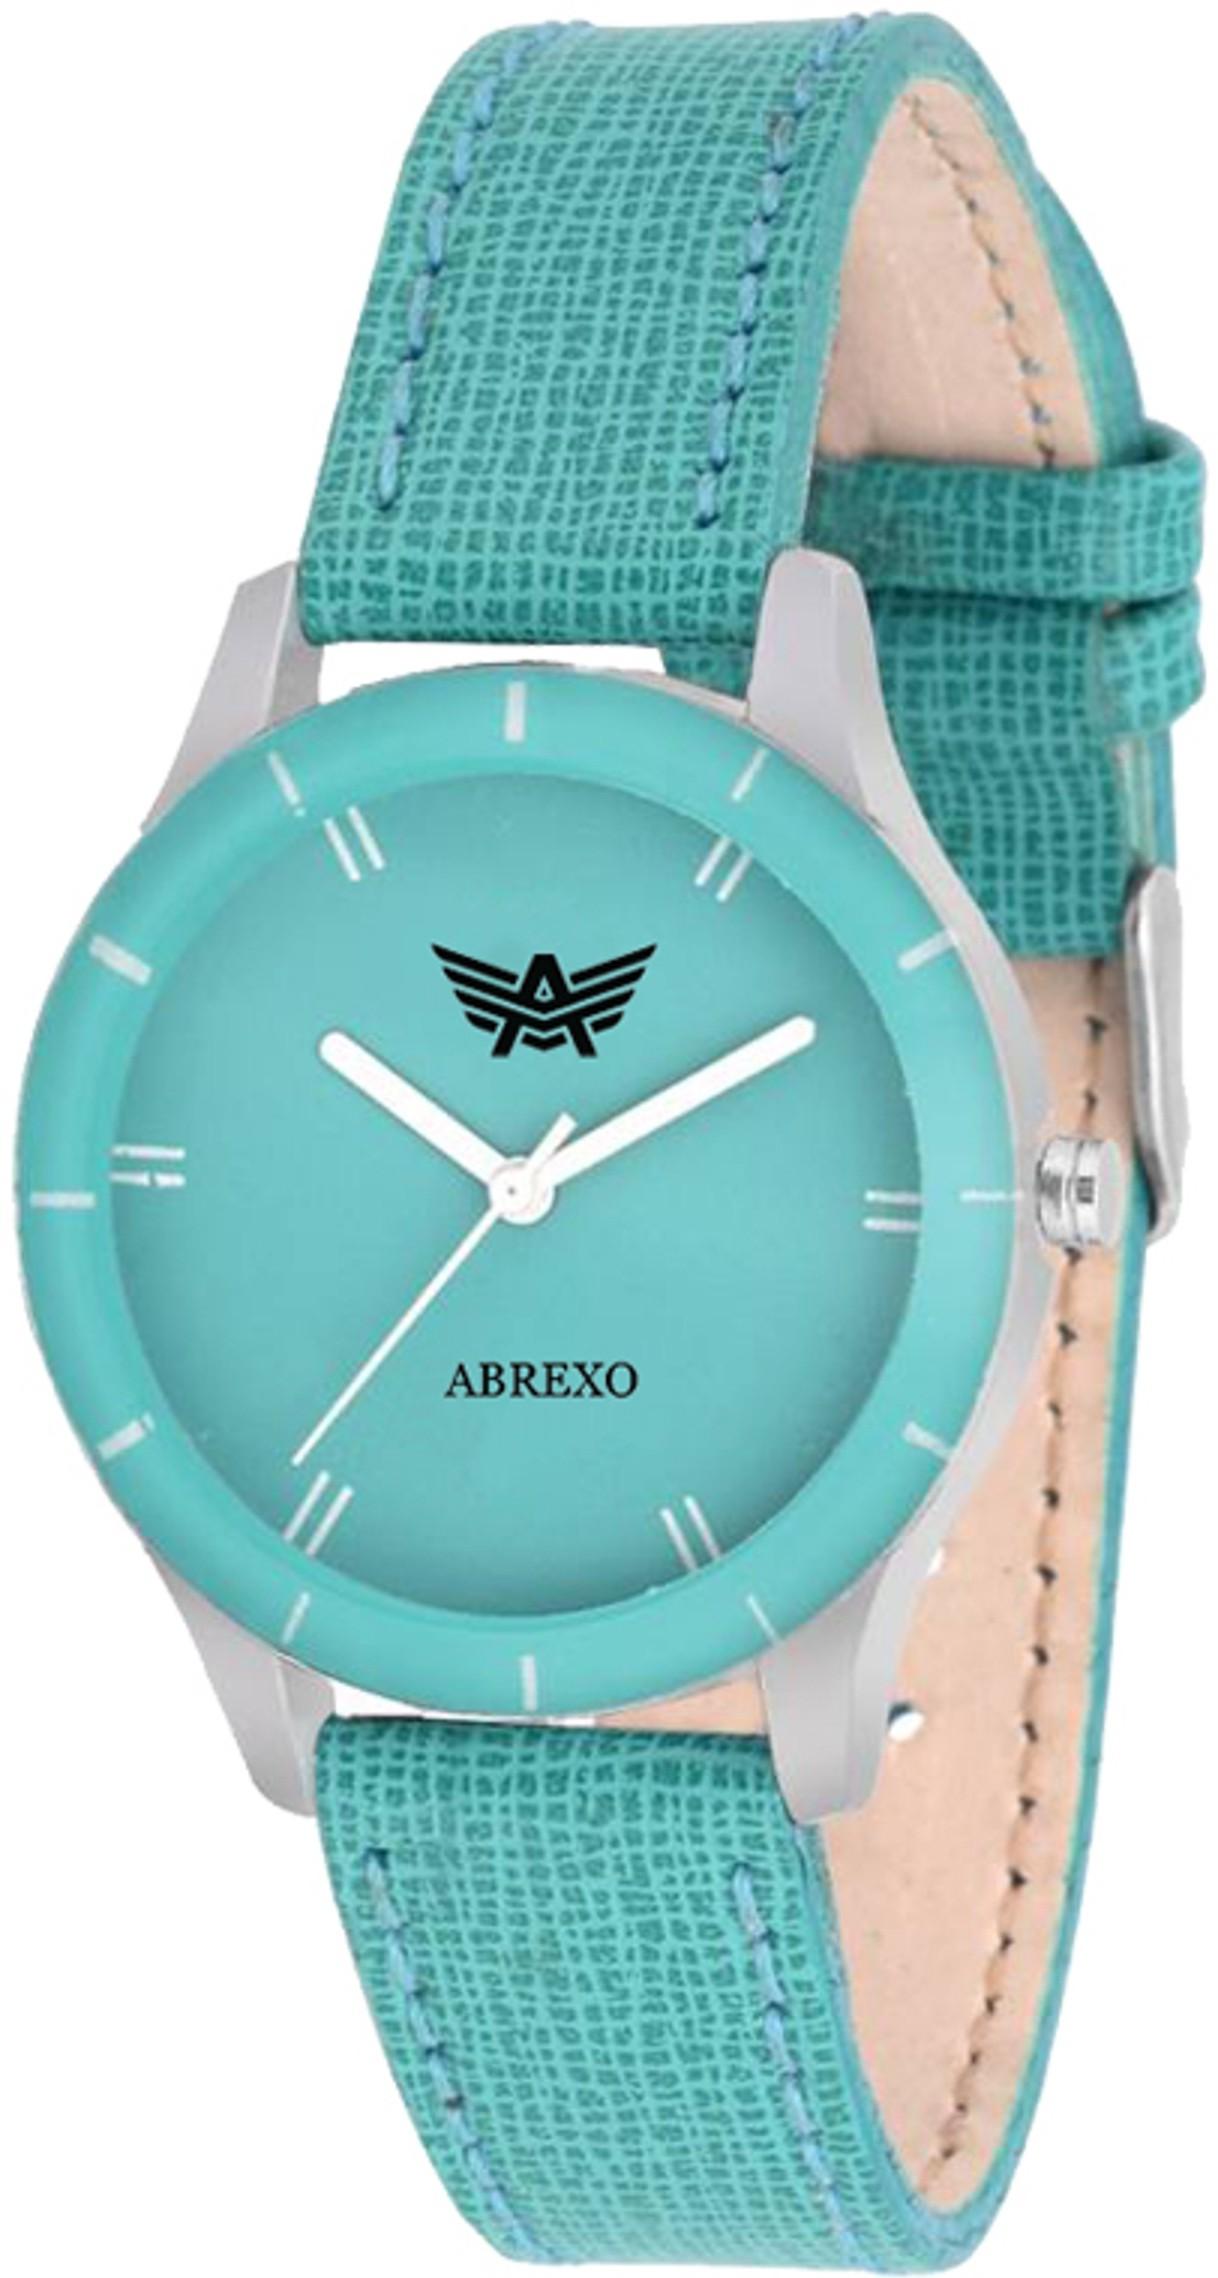 Deals - Delhi - Abrexo & more <br> Womens Watches<br> Category - watches<br> Business - Flipkart.com